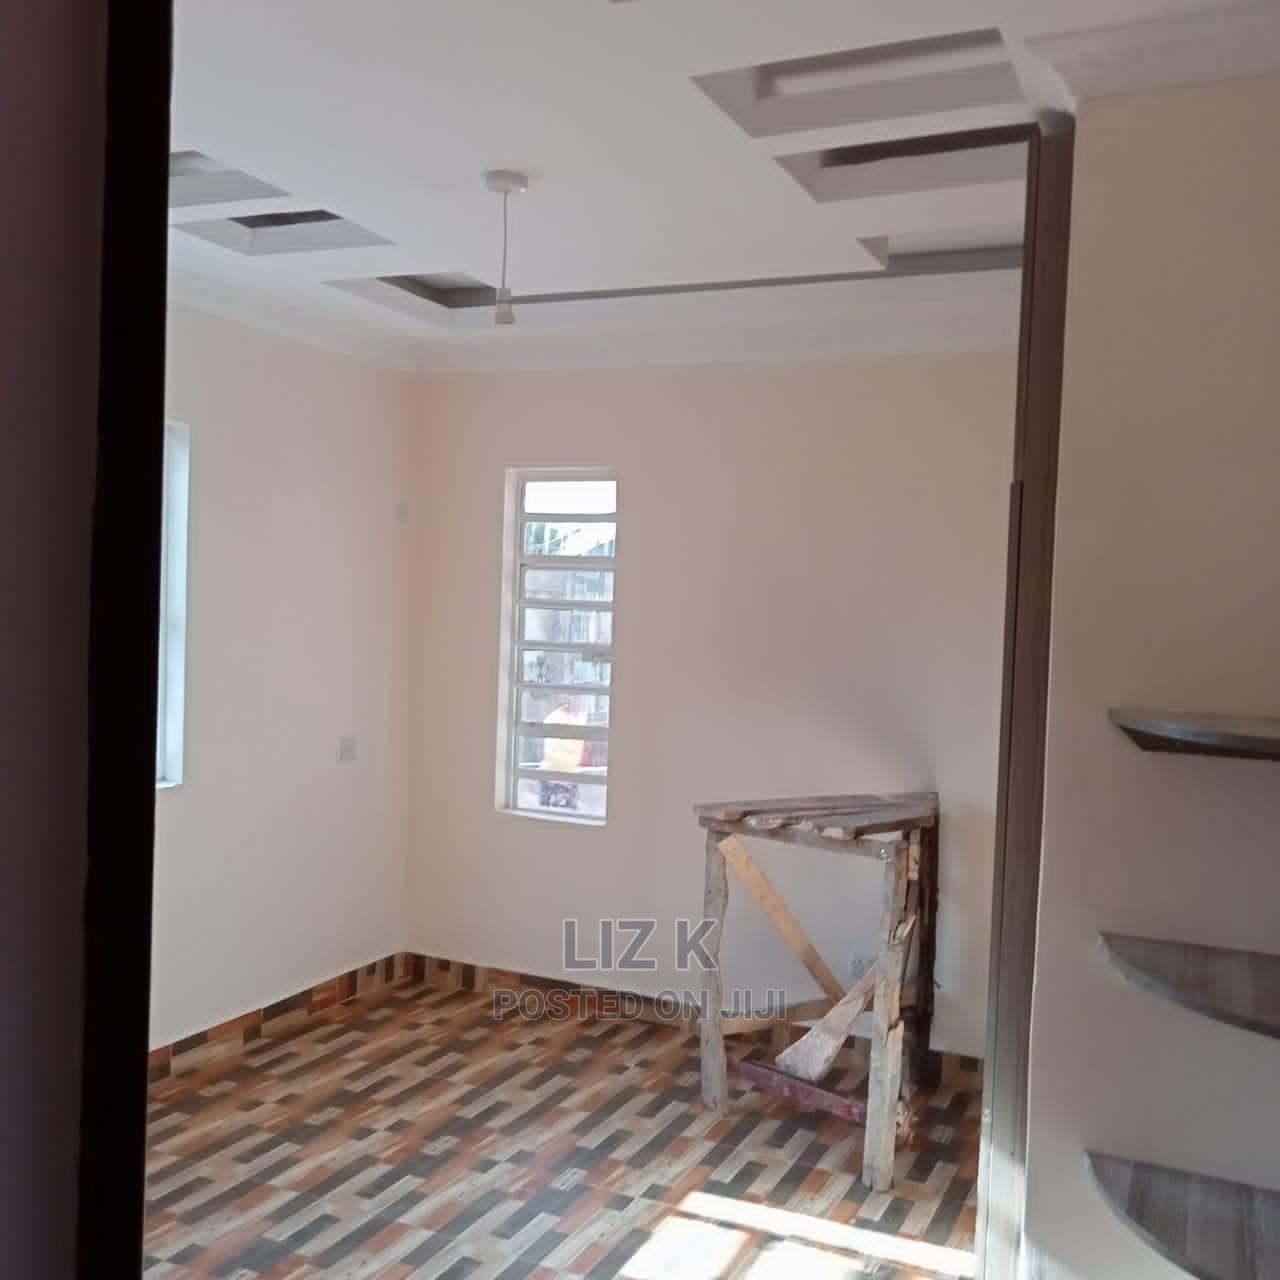 3bdrm Bungalow in Witeithie, Witethie for Sale | Houses & Apartments For Sale for sale in Witethie, Juja, Kenya